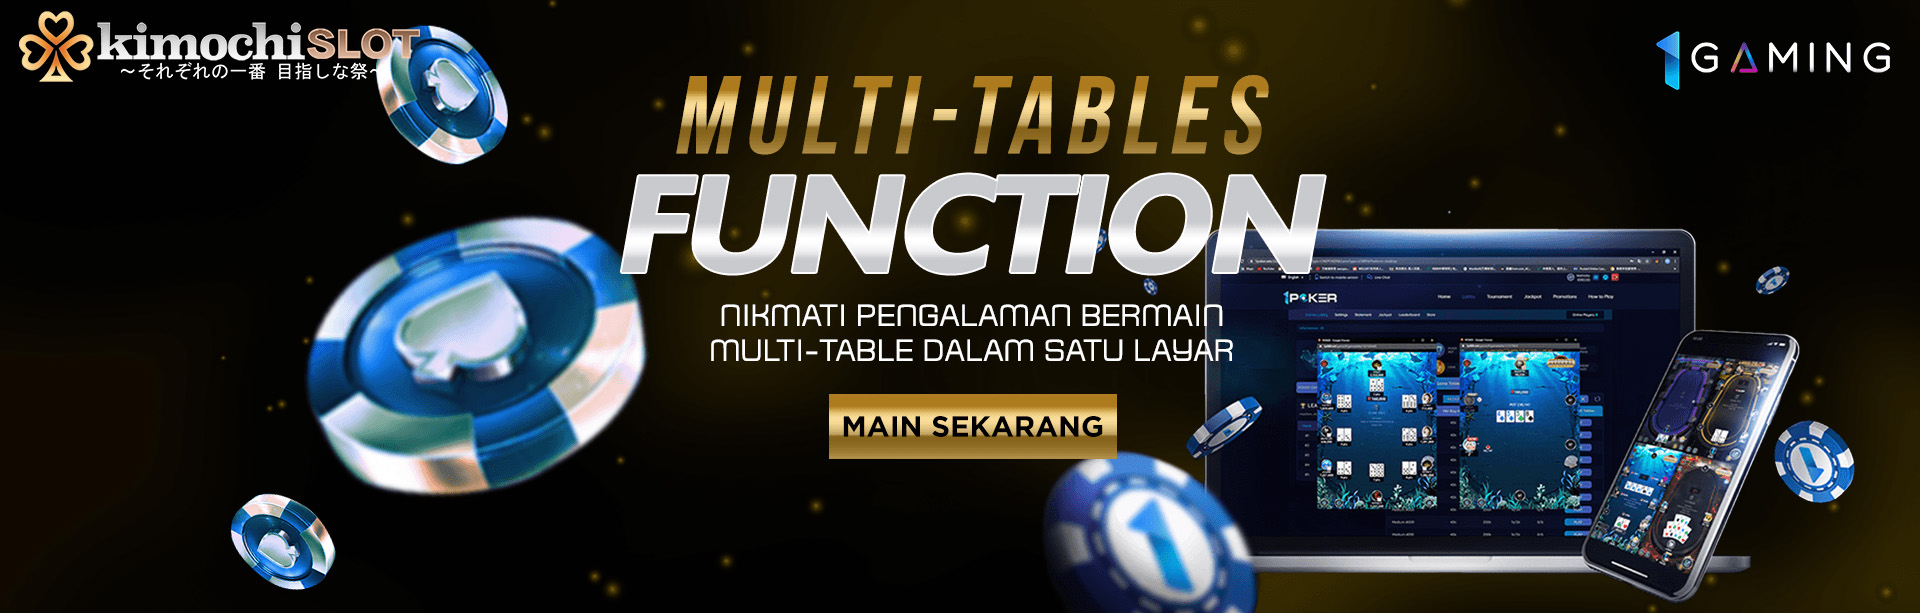 1GAMING MULTI TABLE